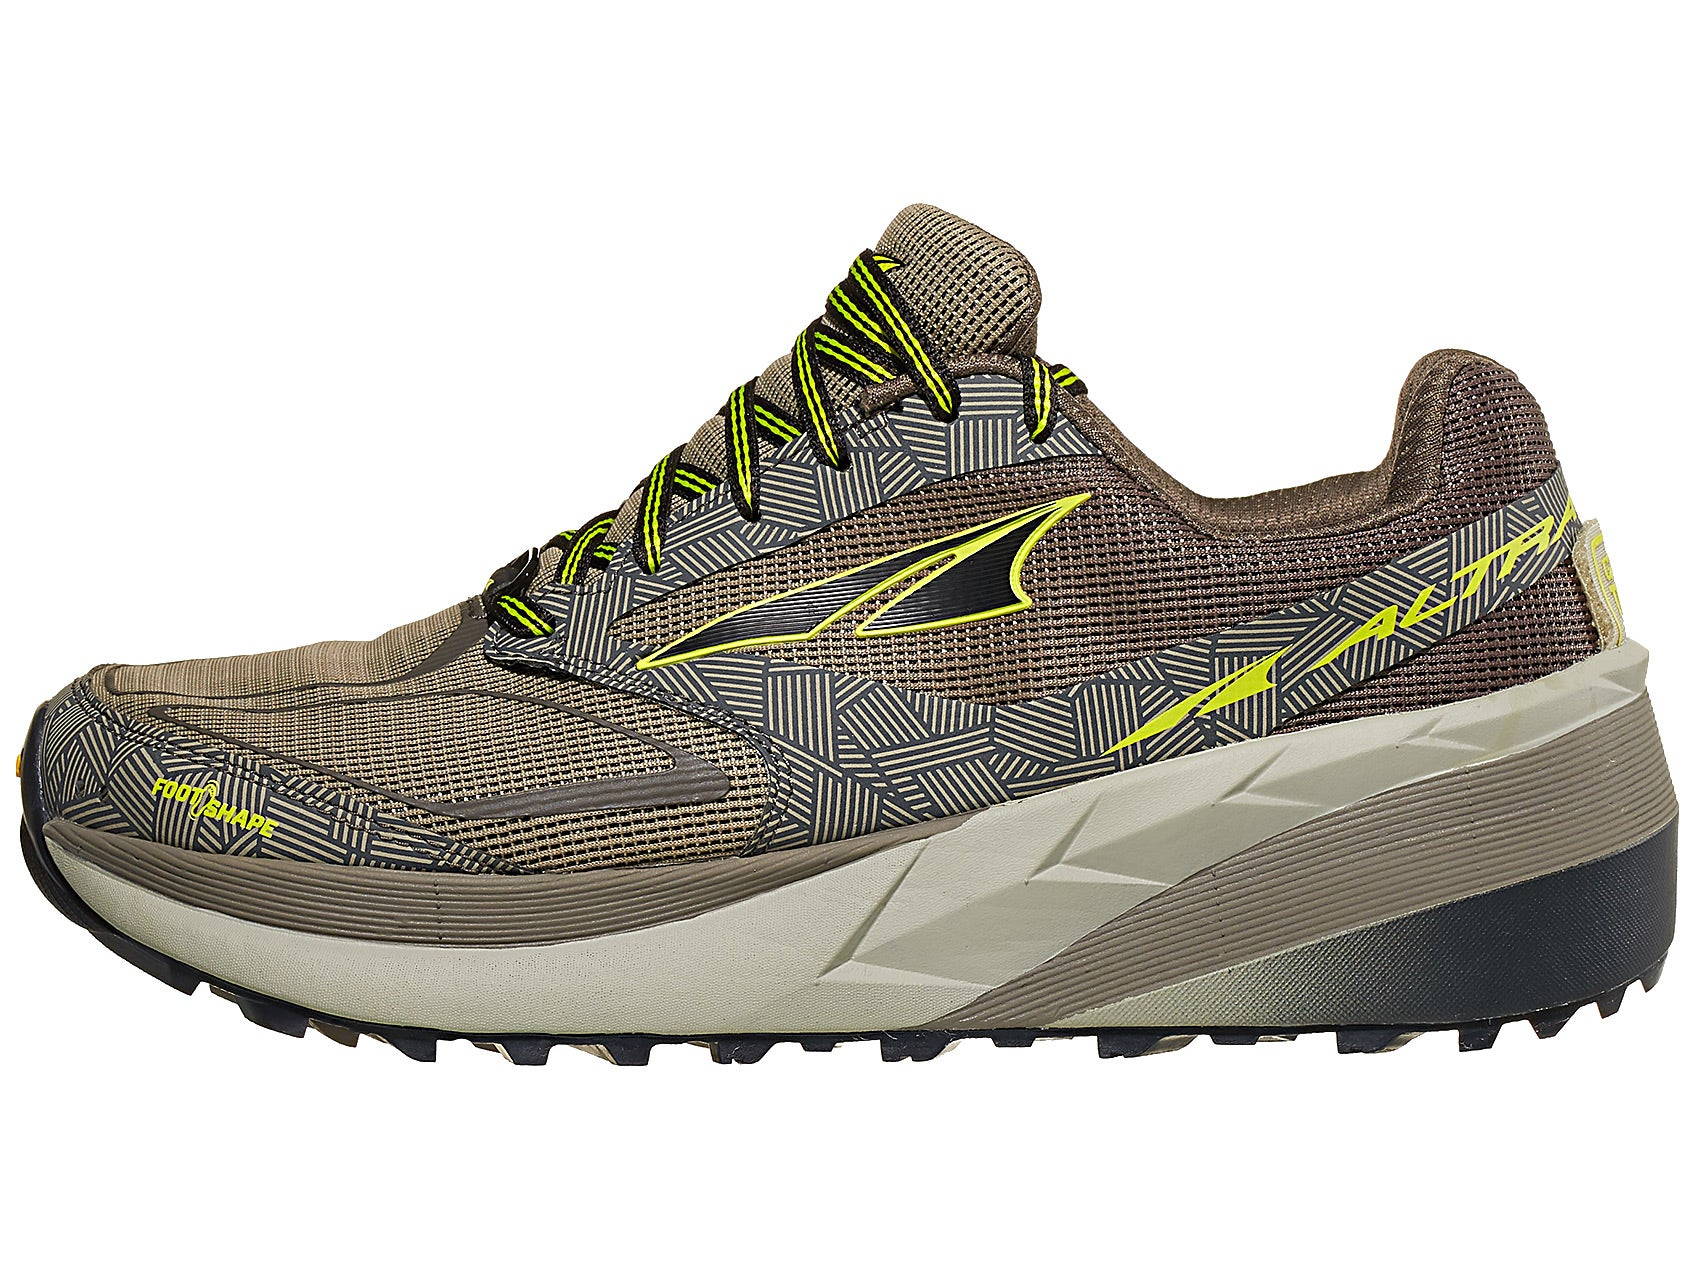 Altra Superior 3 5 Men Zero Drop Wide Fitting Trail Running Shoes Sport Herren